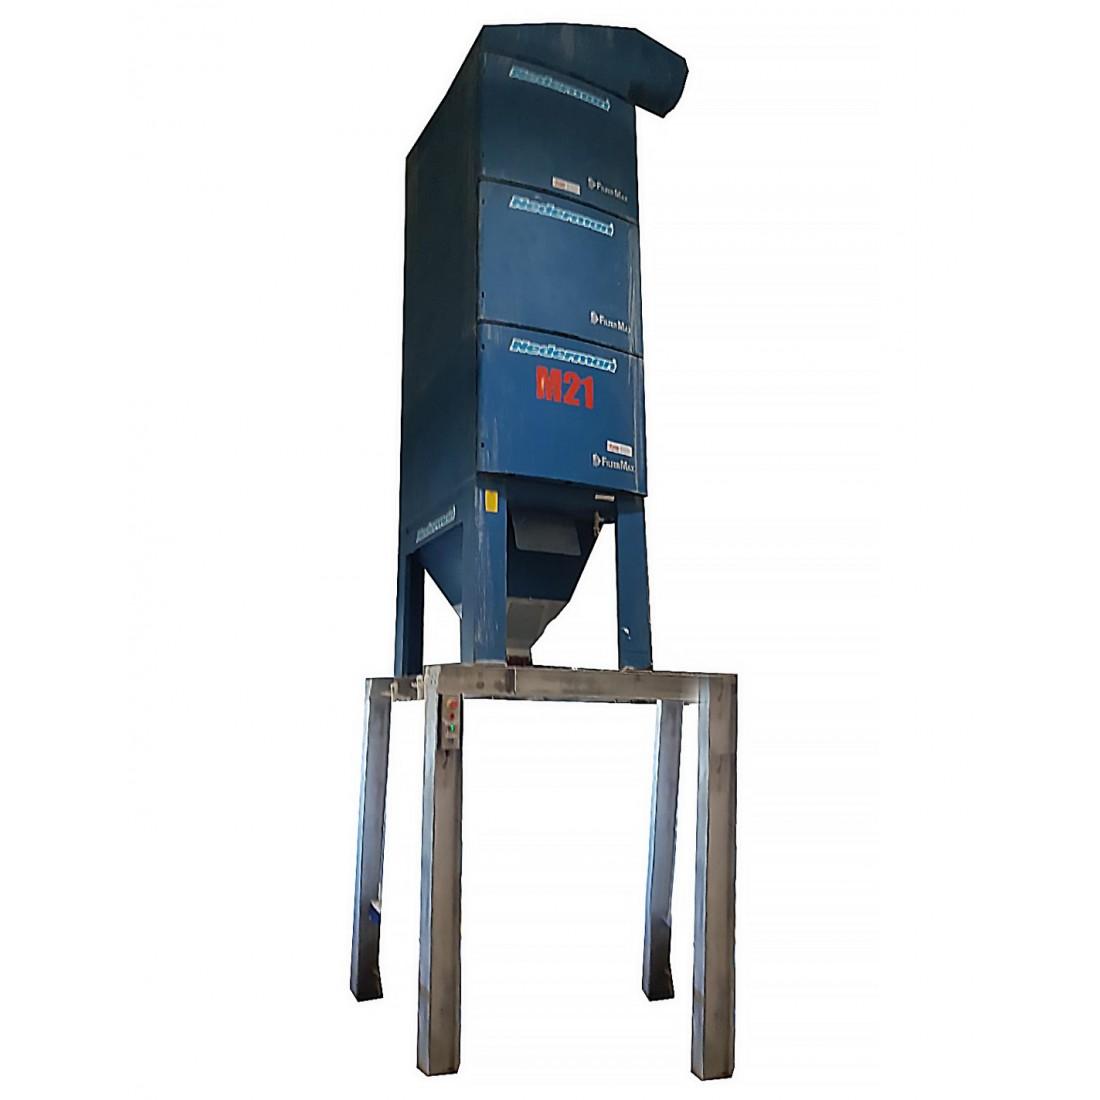 R1J1176 NEDERMAN Dust unit filter - Hp15 - pneumatic shaking